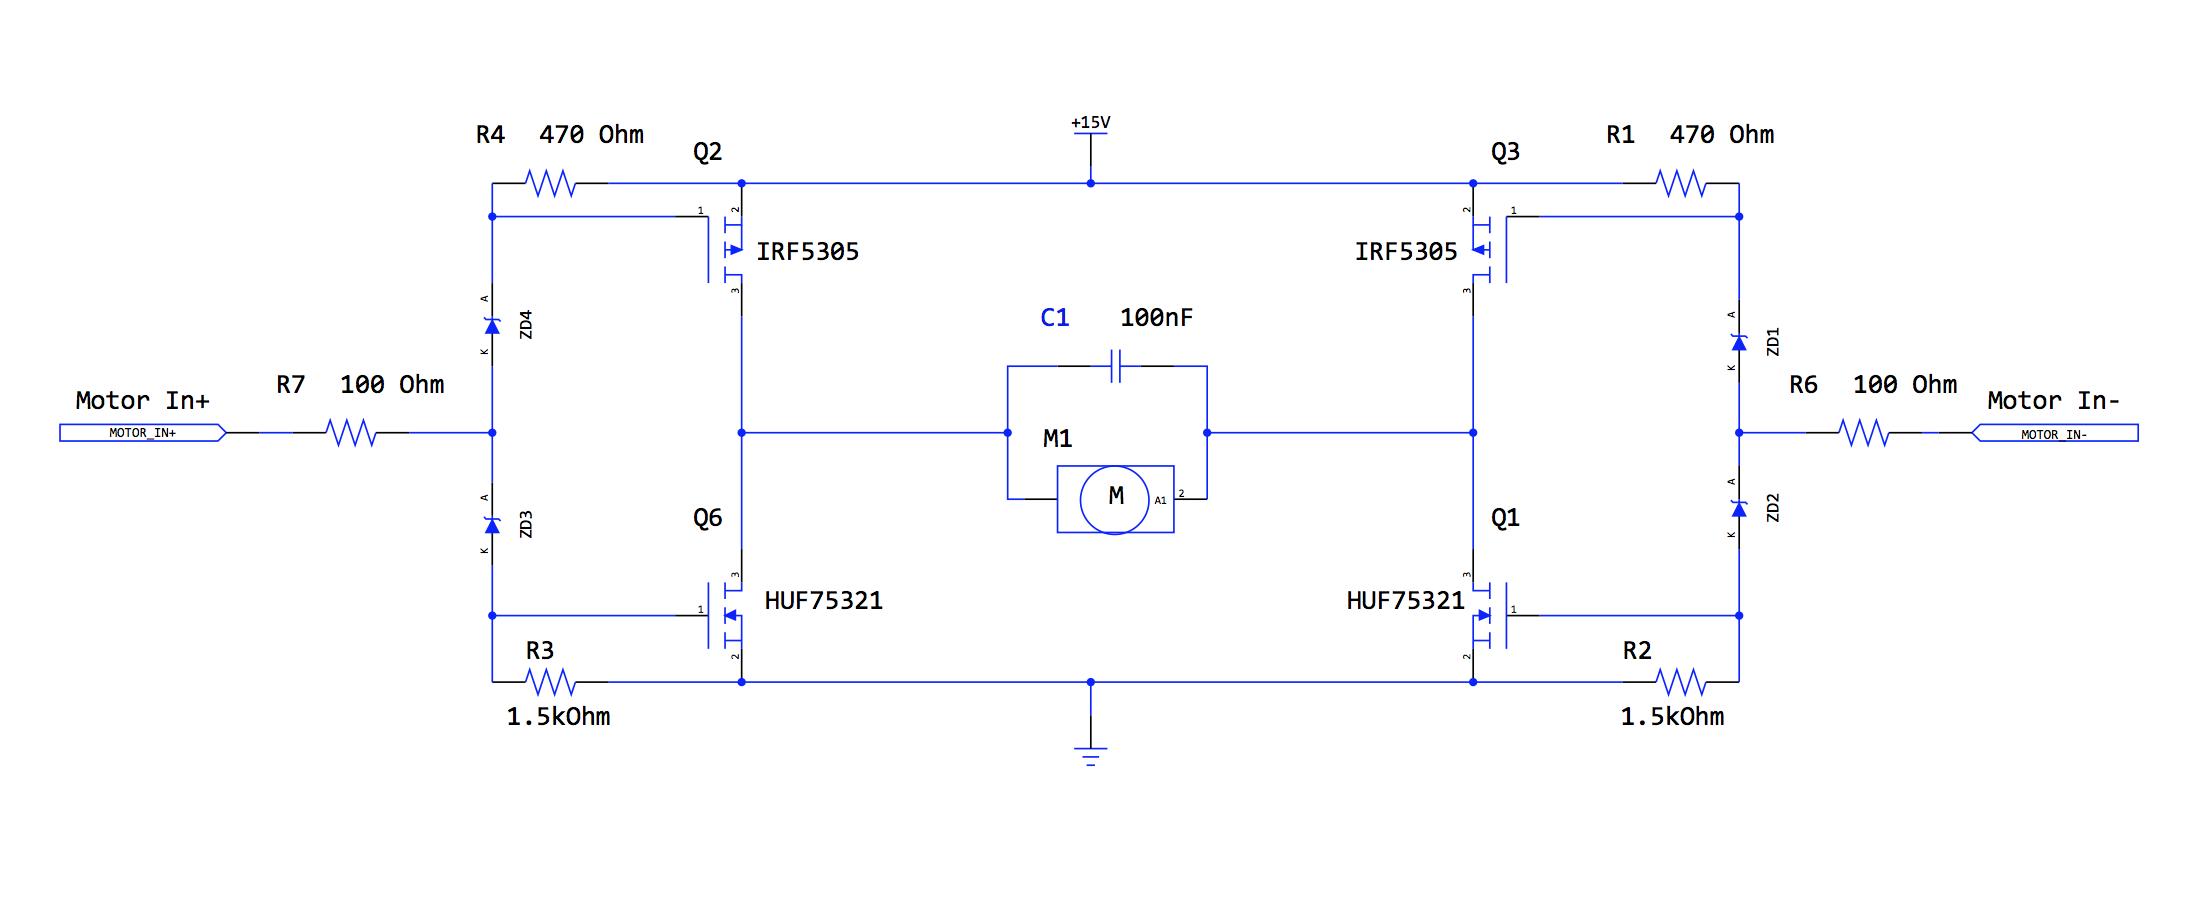 Electronic And Sensor Systems H Bridge Circuit Design Motor Driver